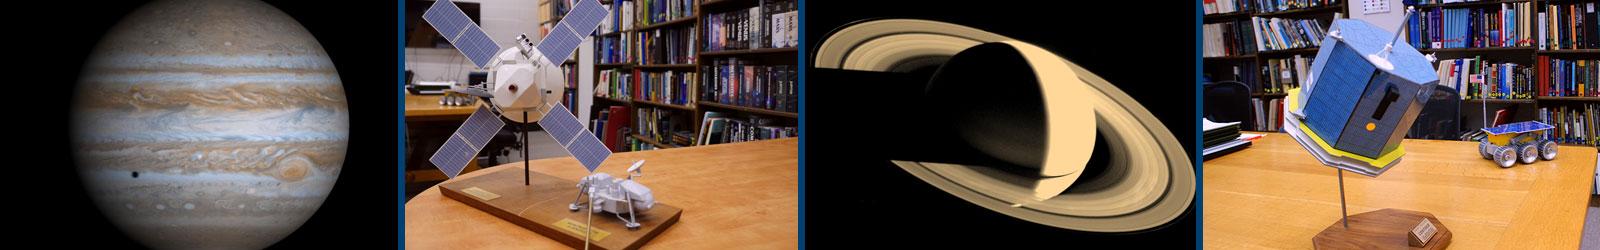 SPIF Banner: library probe prototypes Jupiter Saturn